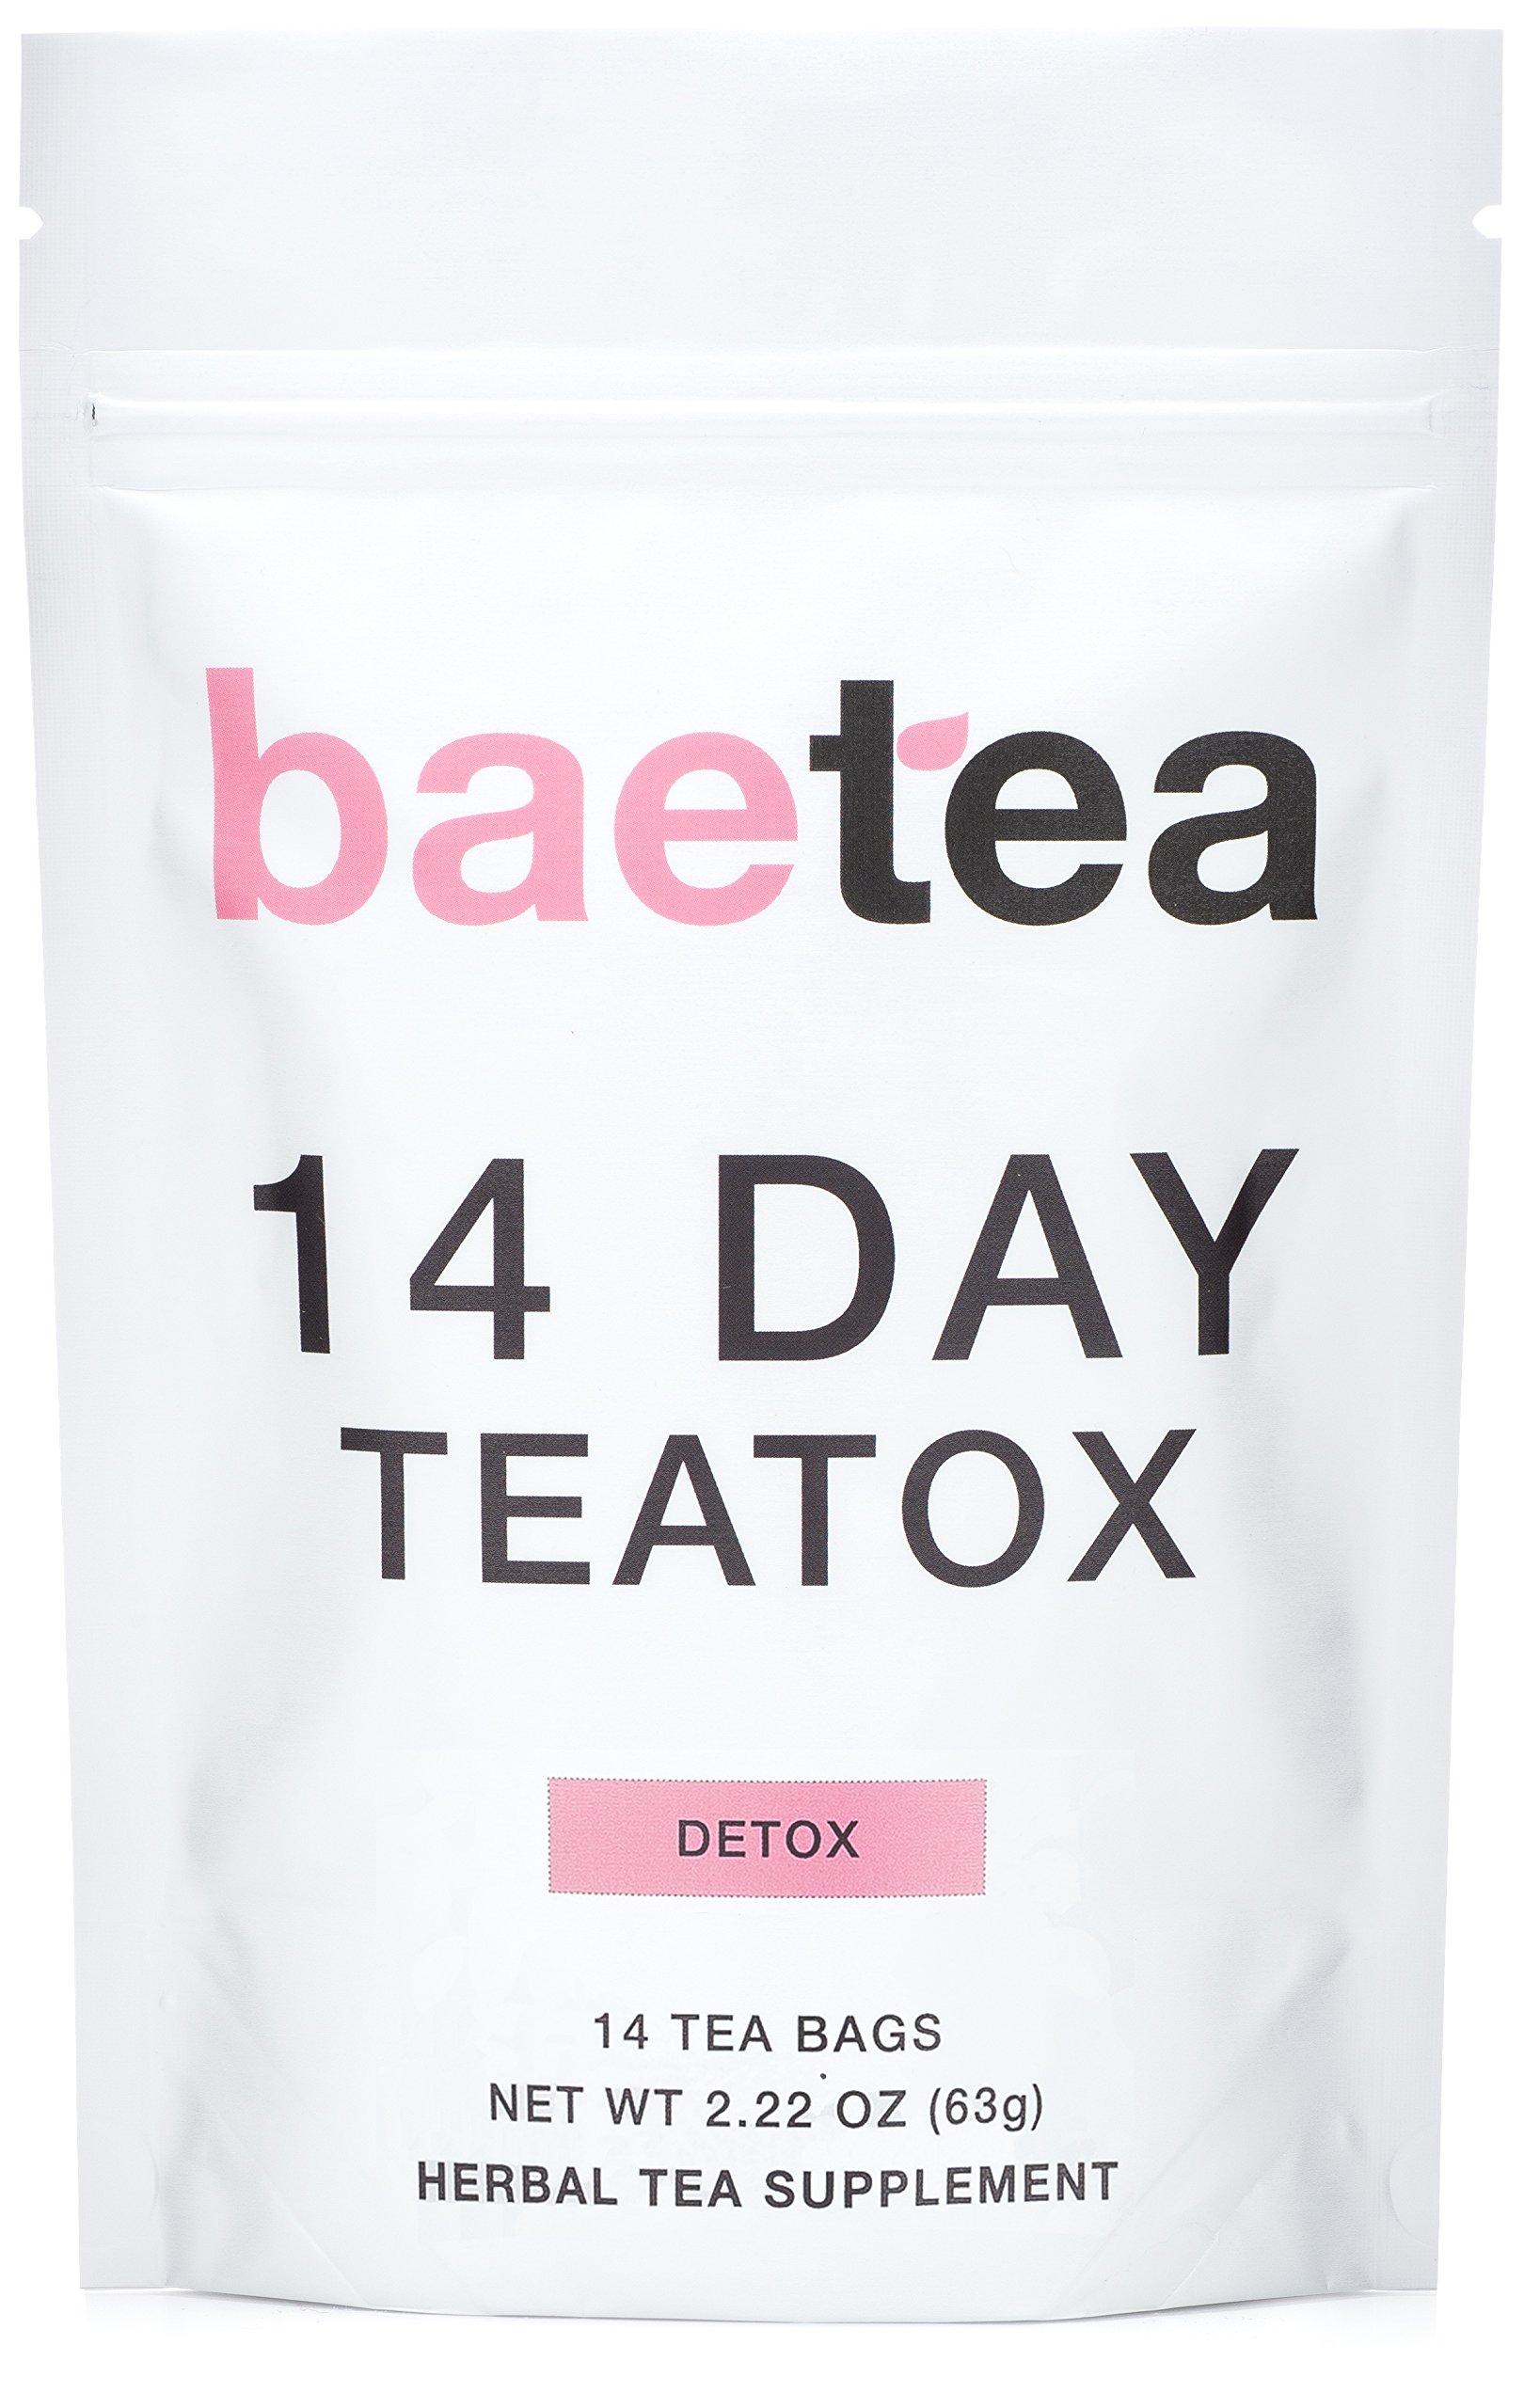 Baetea 14 Day Teatox Detox Herbal Tea Supplement (14 Tea Bags)